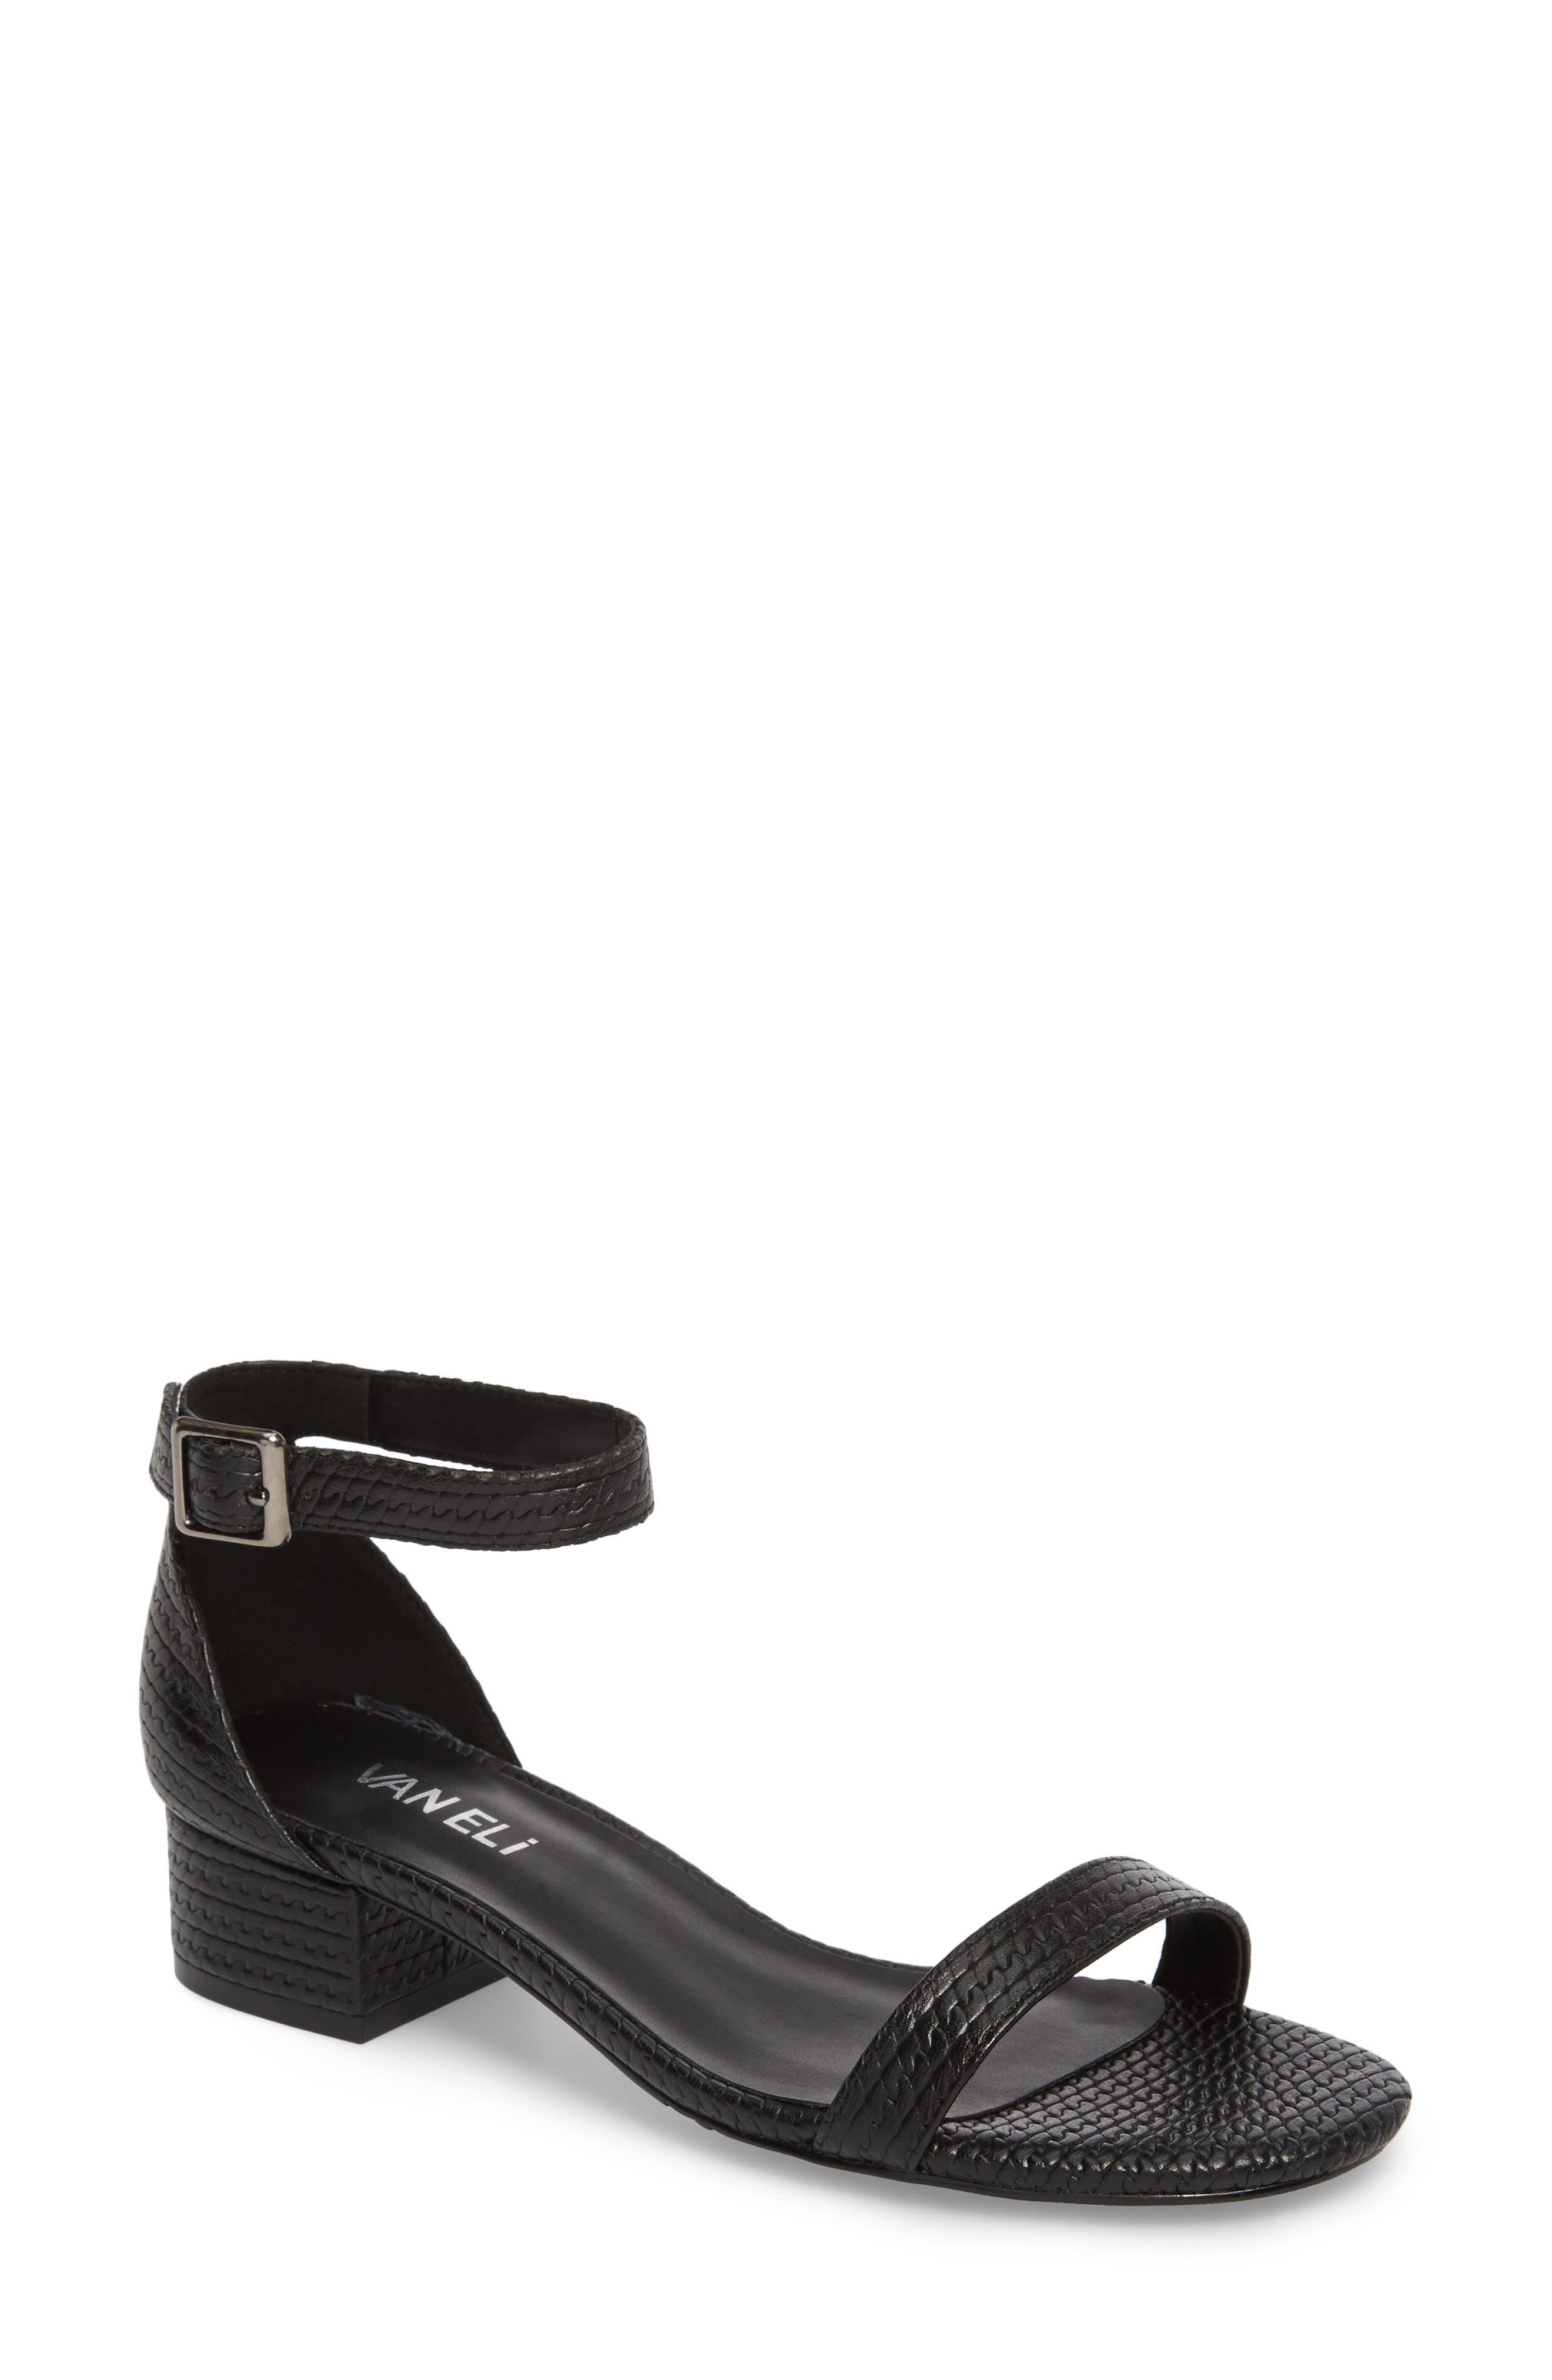 Hirin Sandal,                             Main thumbnail 1, color,                             Black Printed Leather